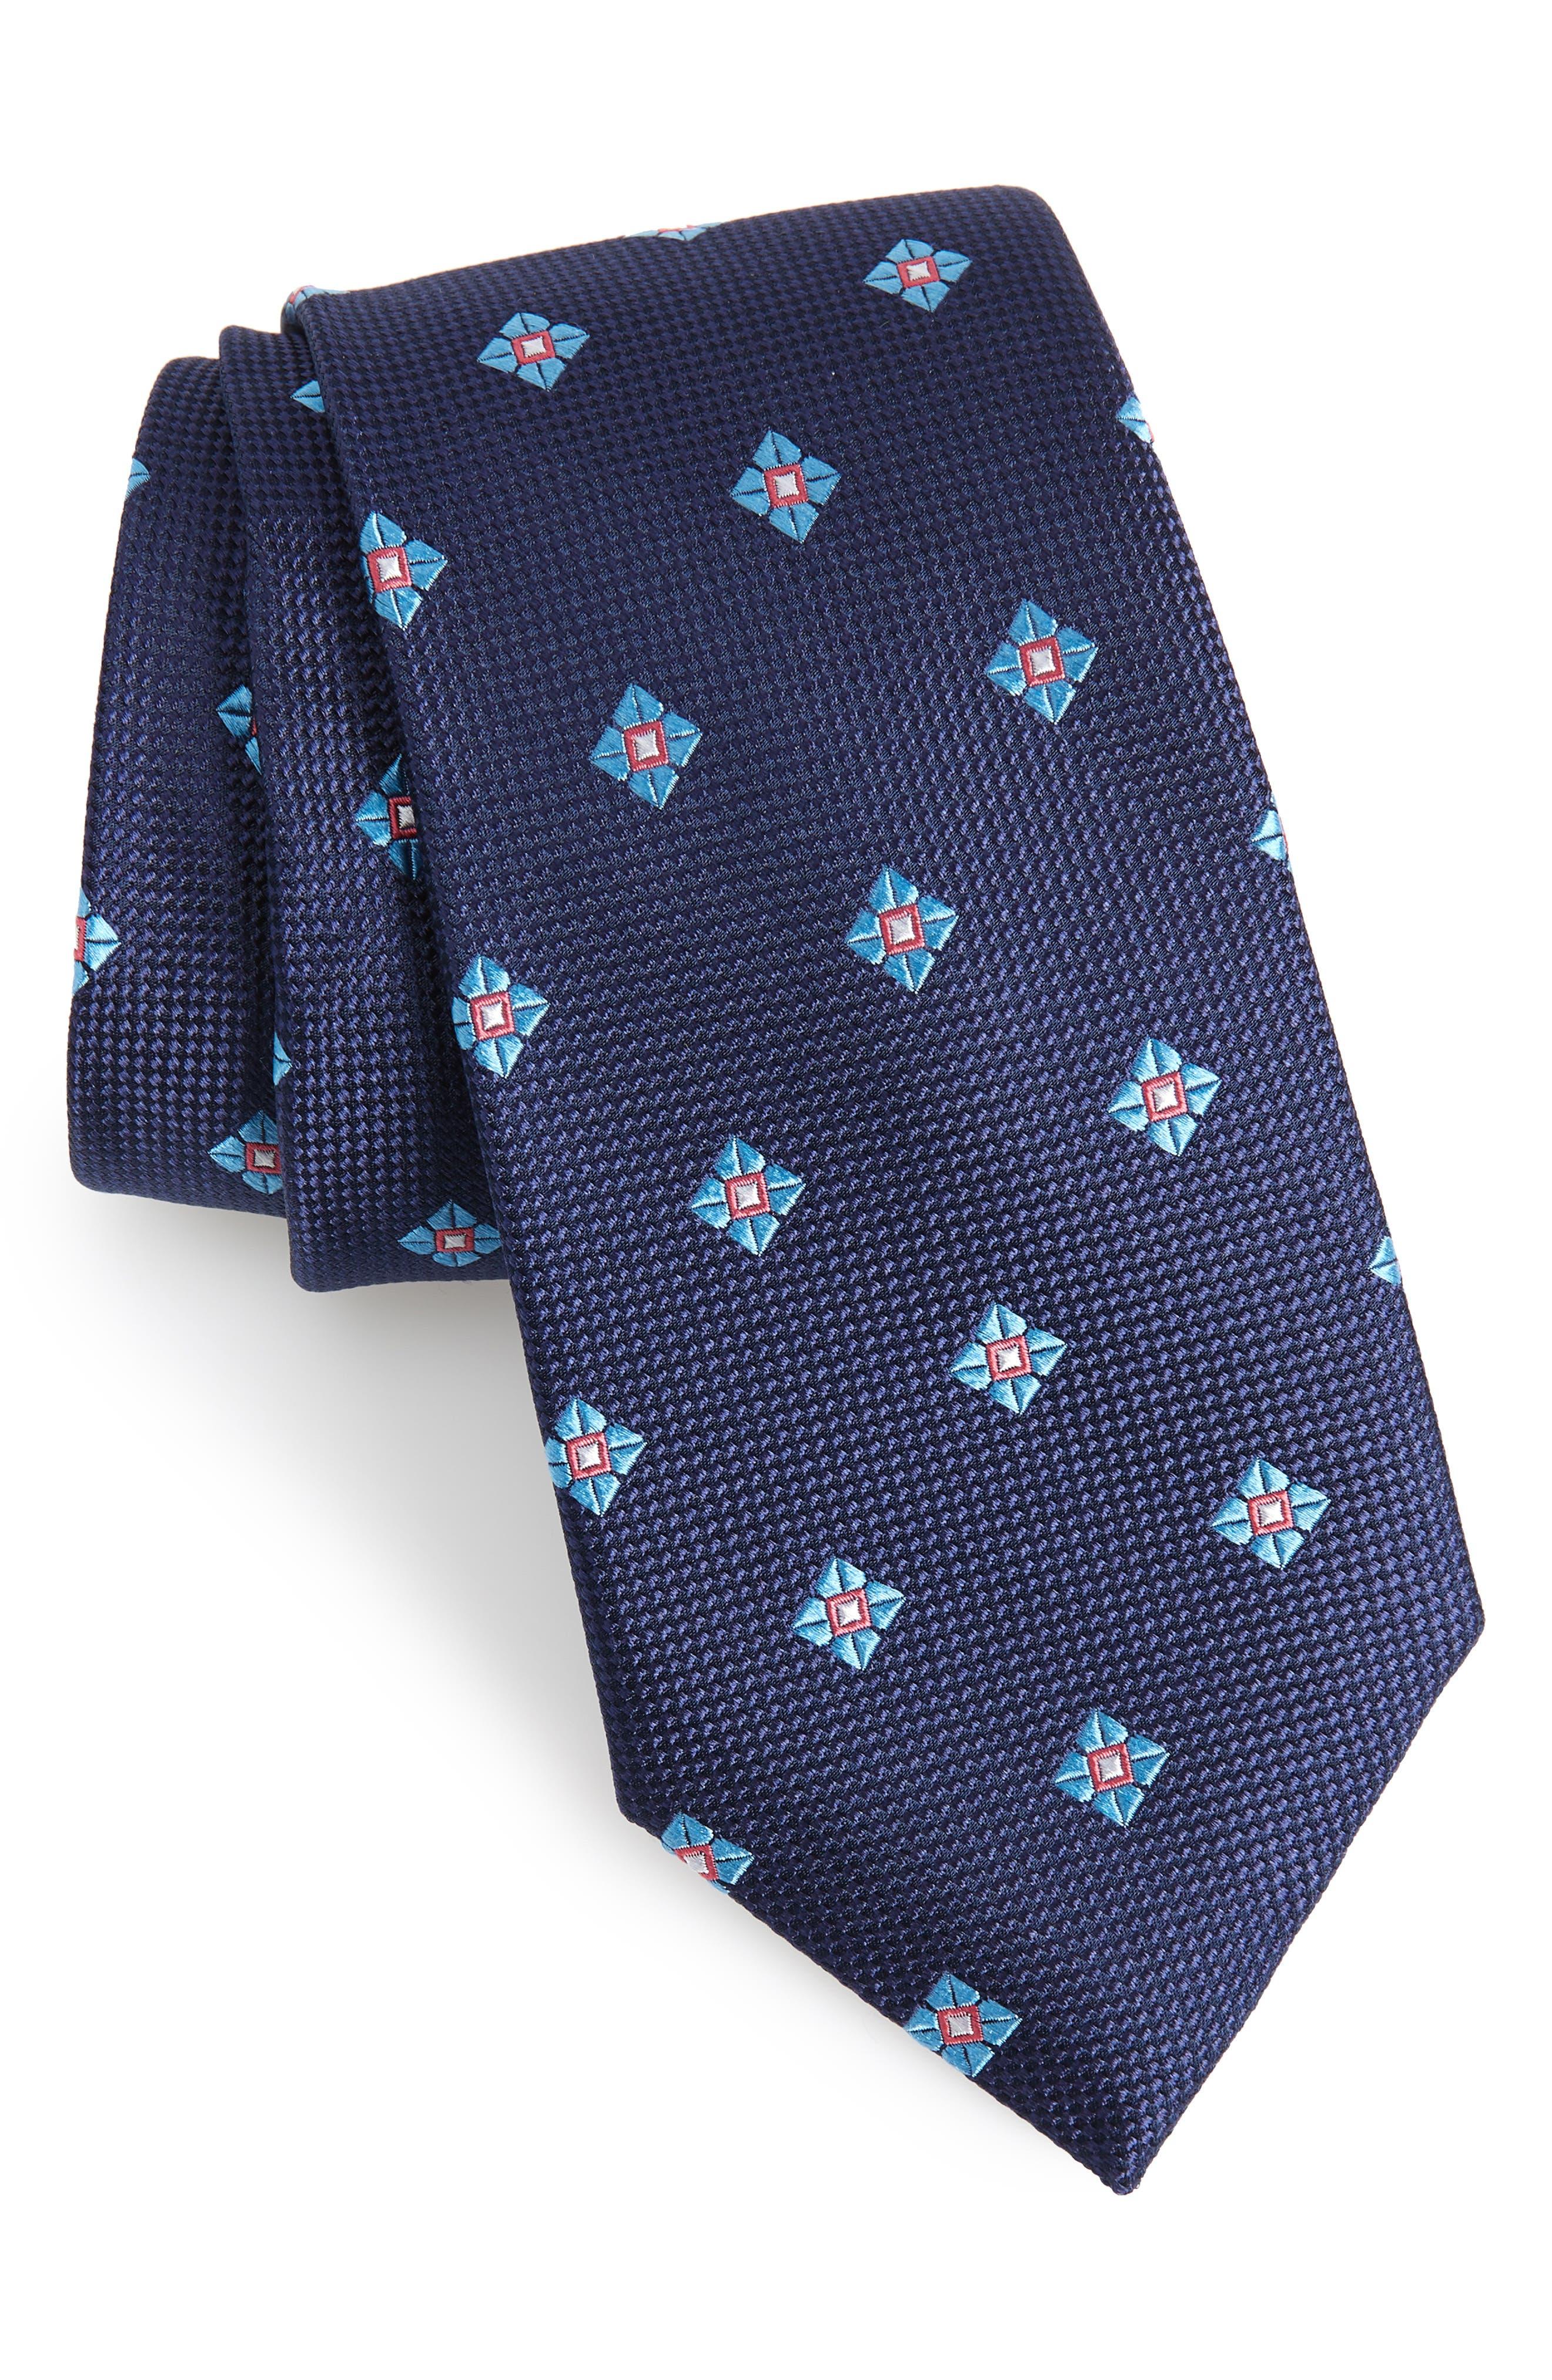 Oxford Medallion Silk Tie,                         Main,                         color, Navy